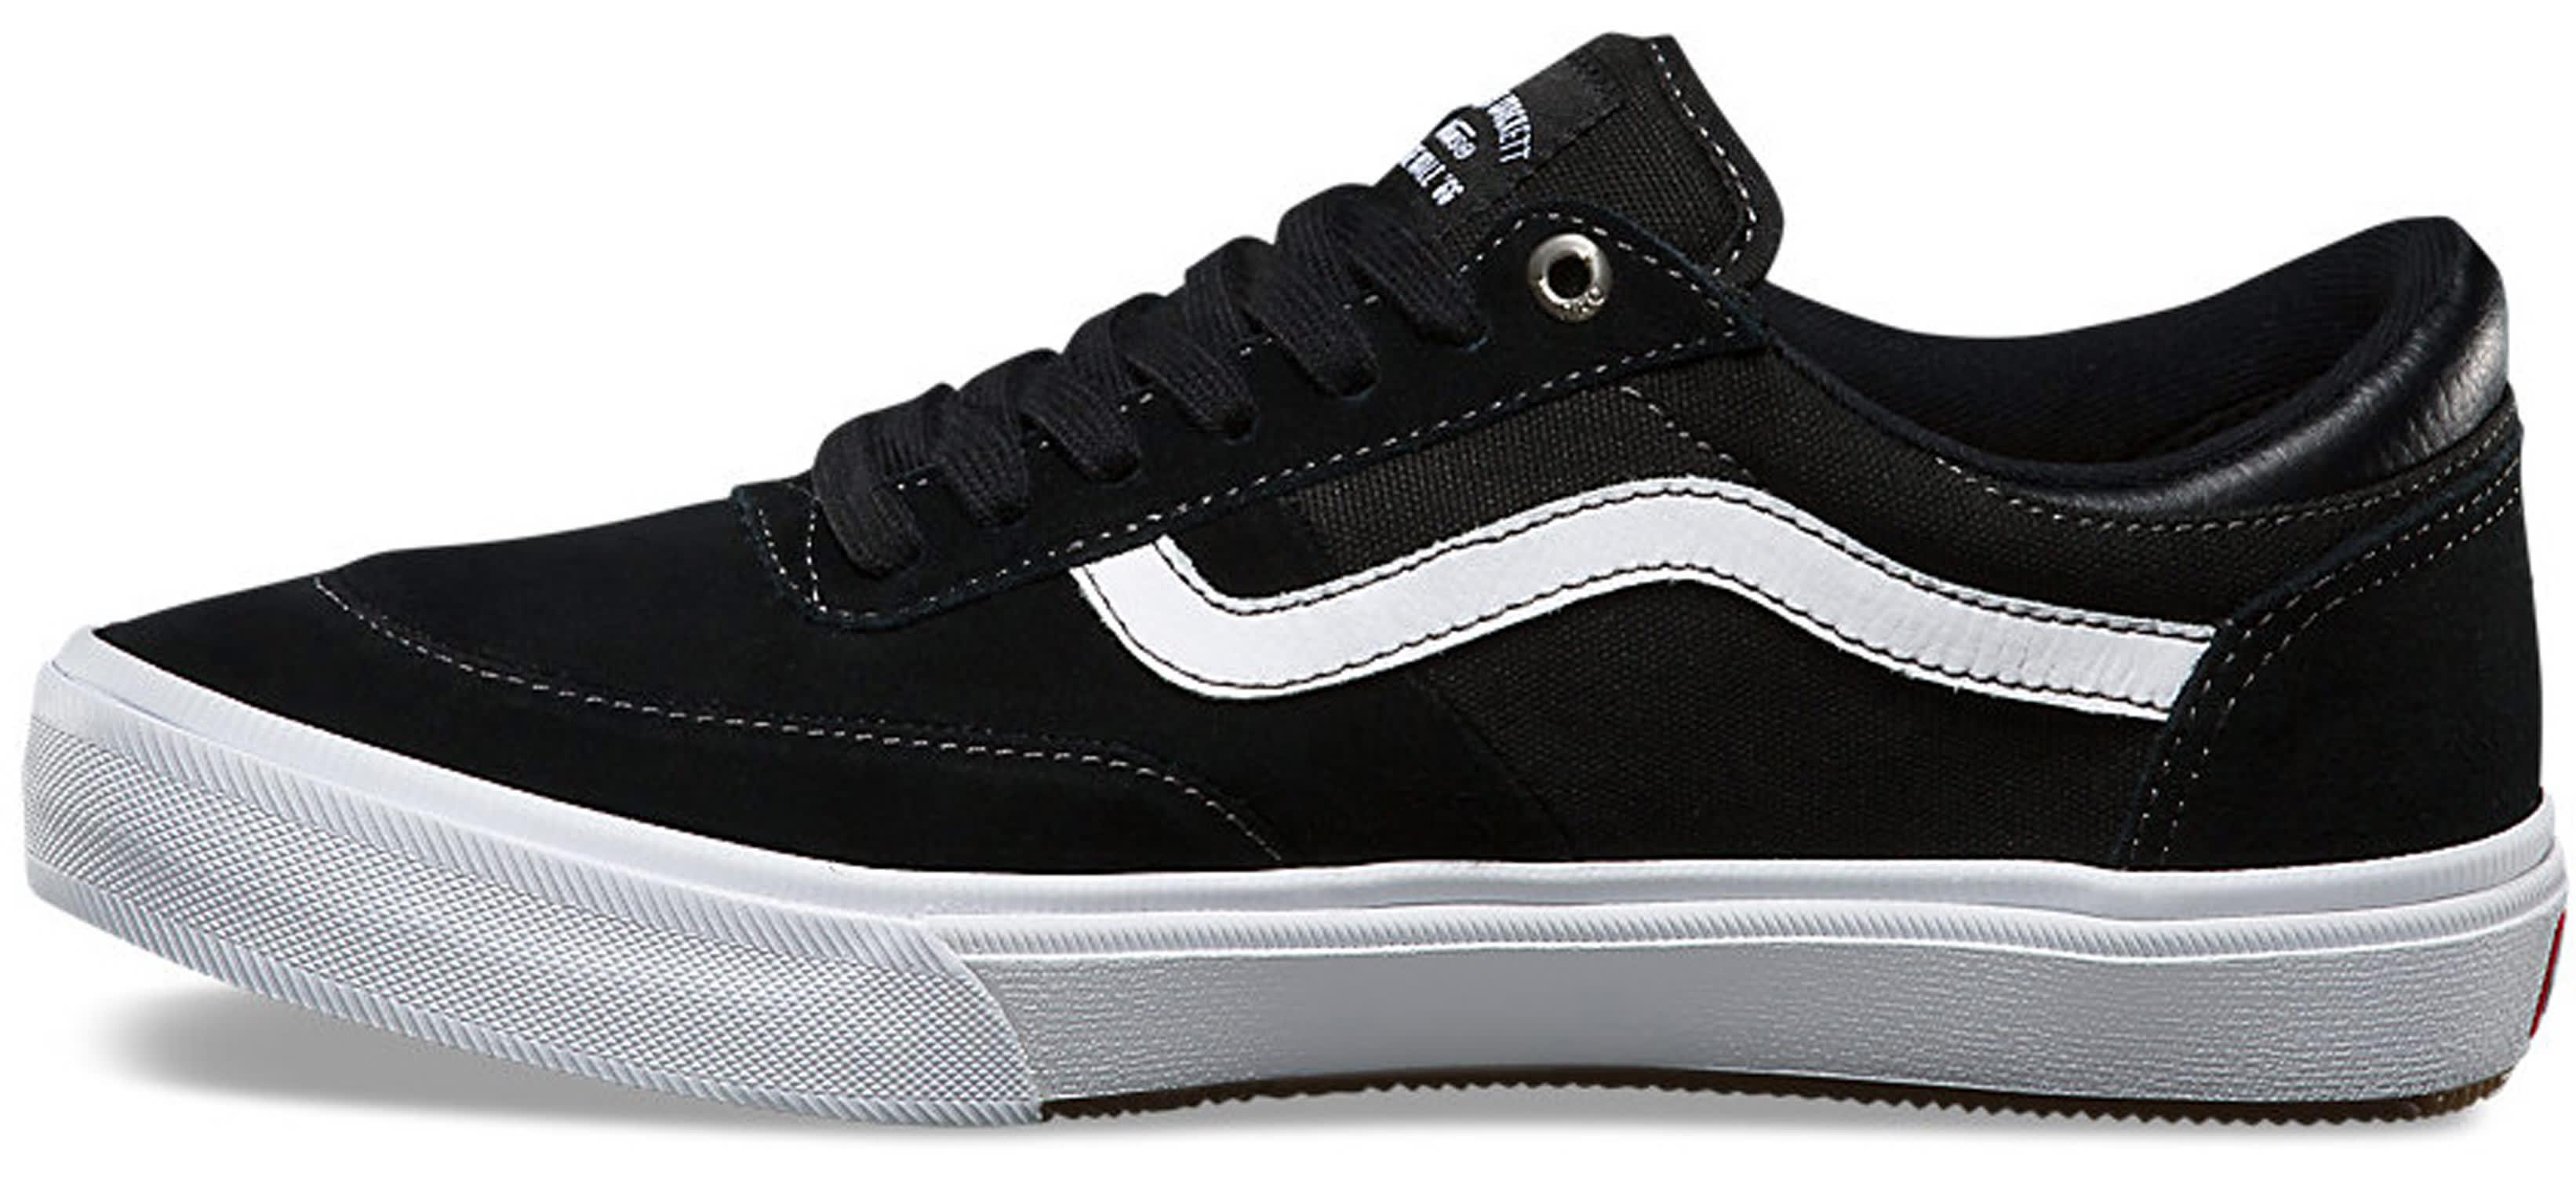 bbffb00177b Vans Gilbert Crockett Pro 2 Skate Shoes - thumbnail 3